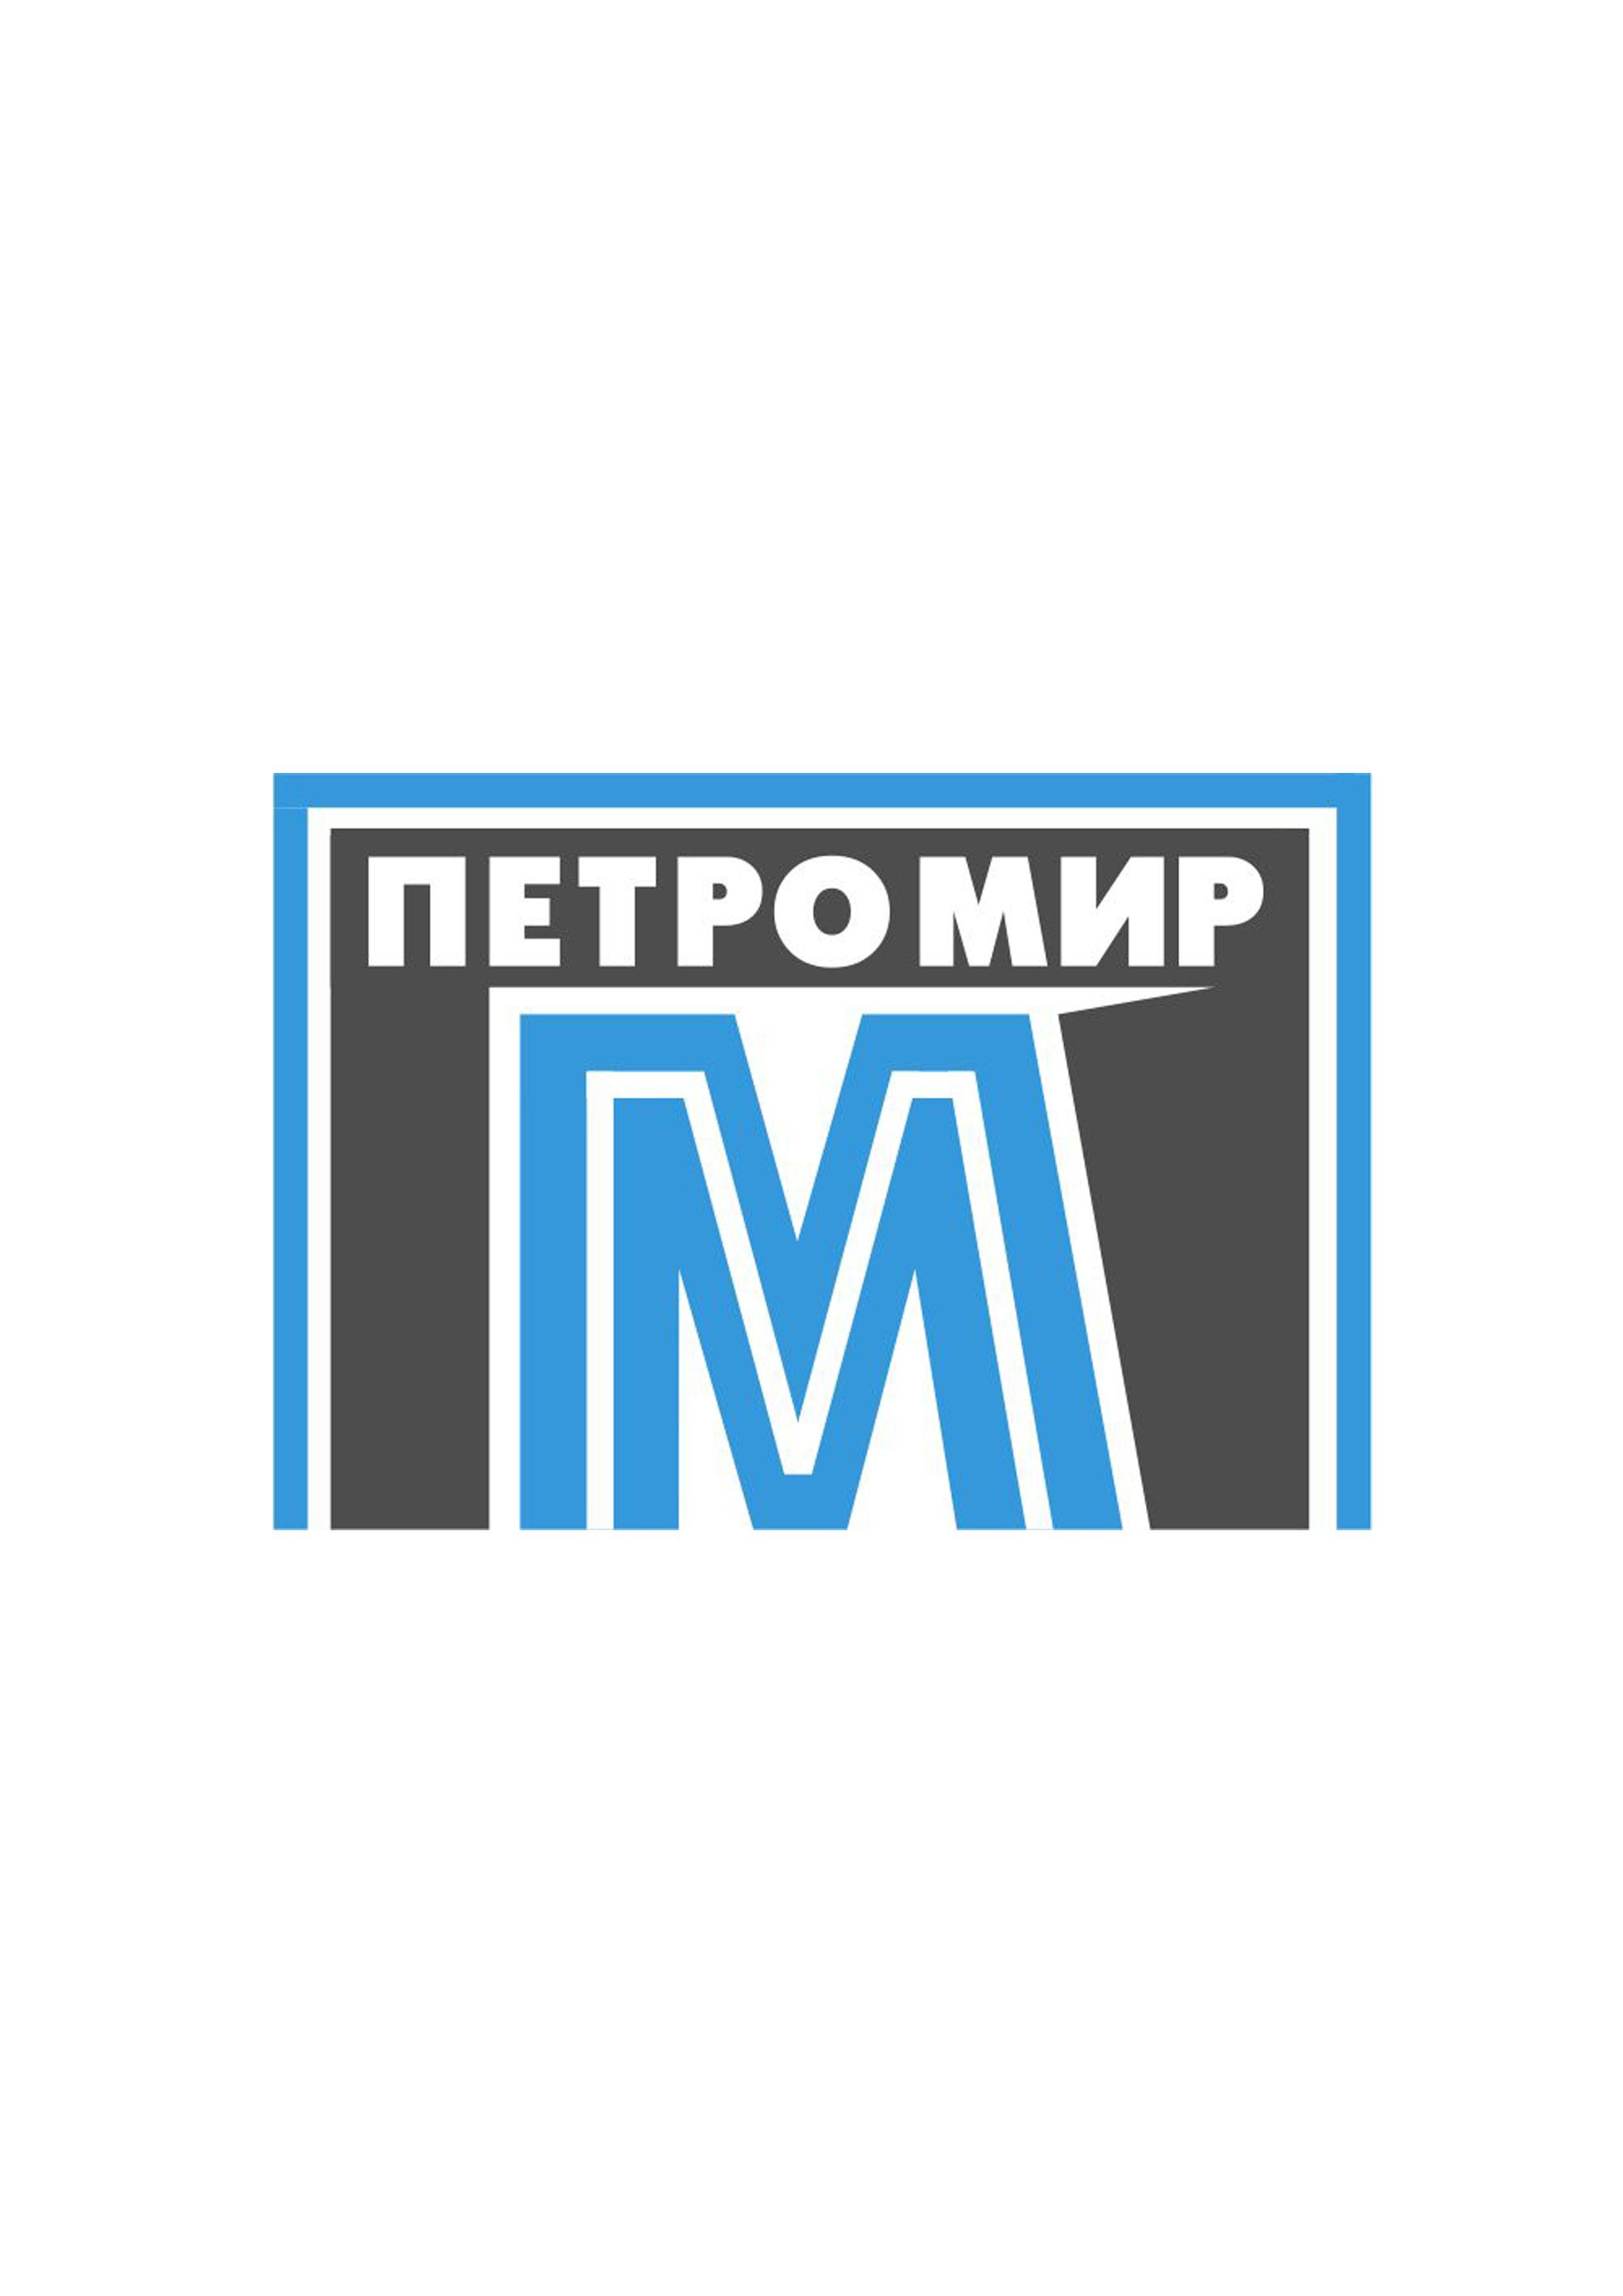 Разработка логотипа - дизайнер Wou1ter